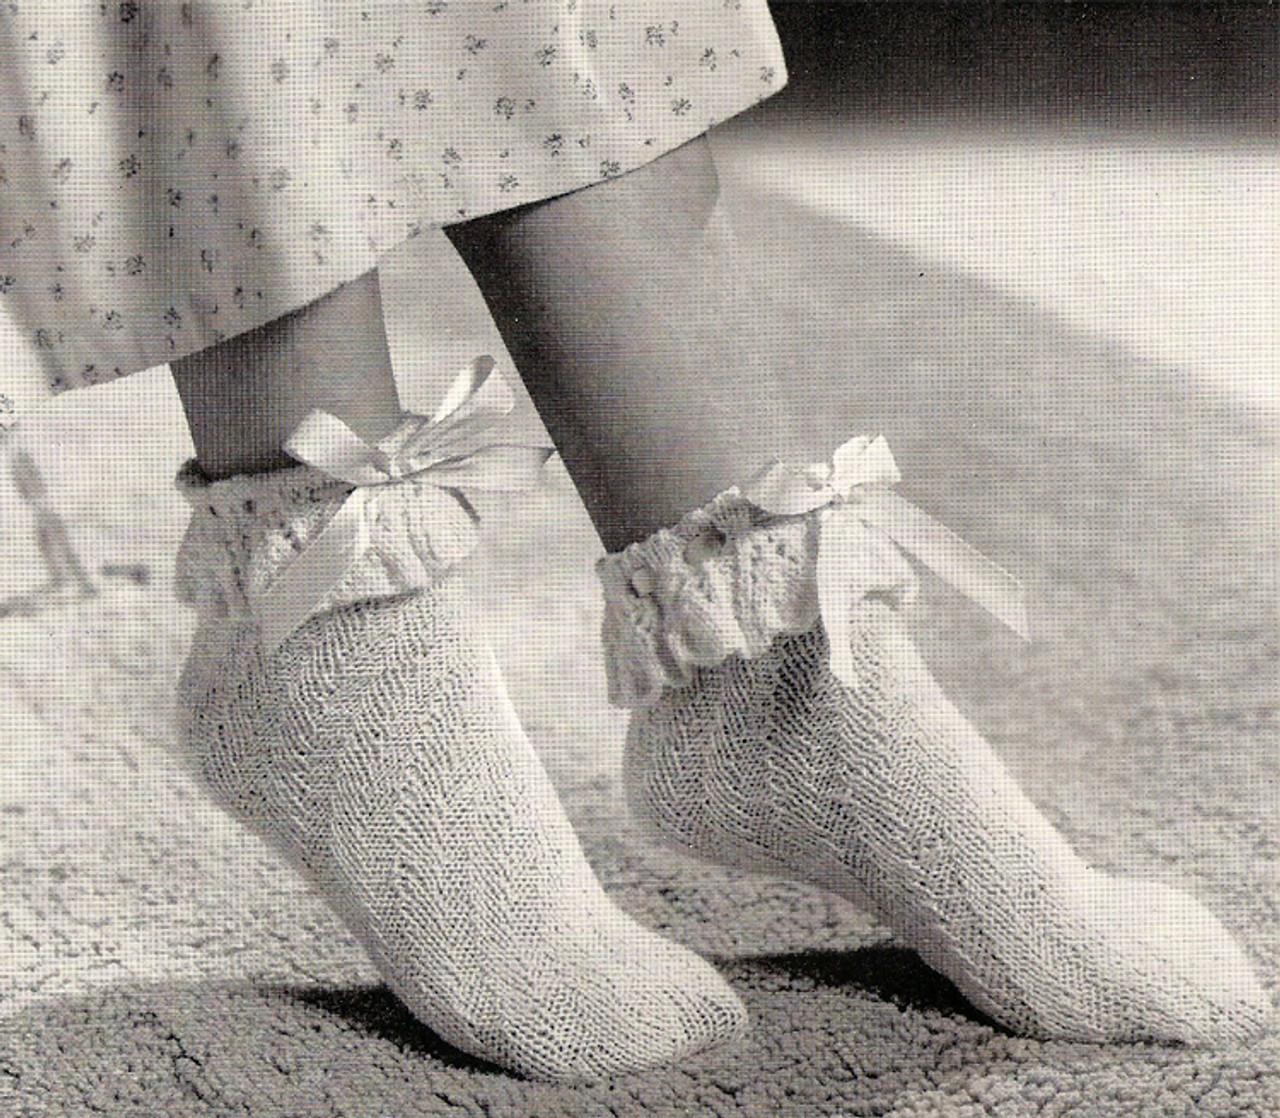 Soft Bed Socks Knitting Pattern